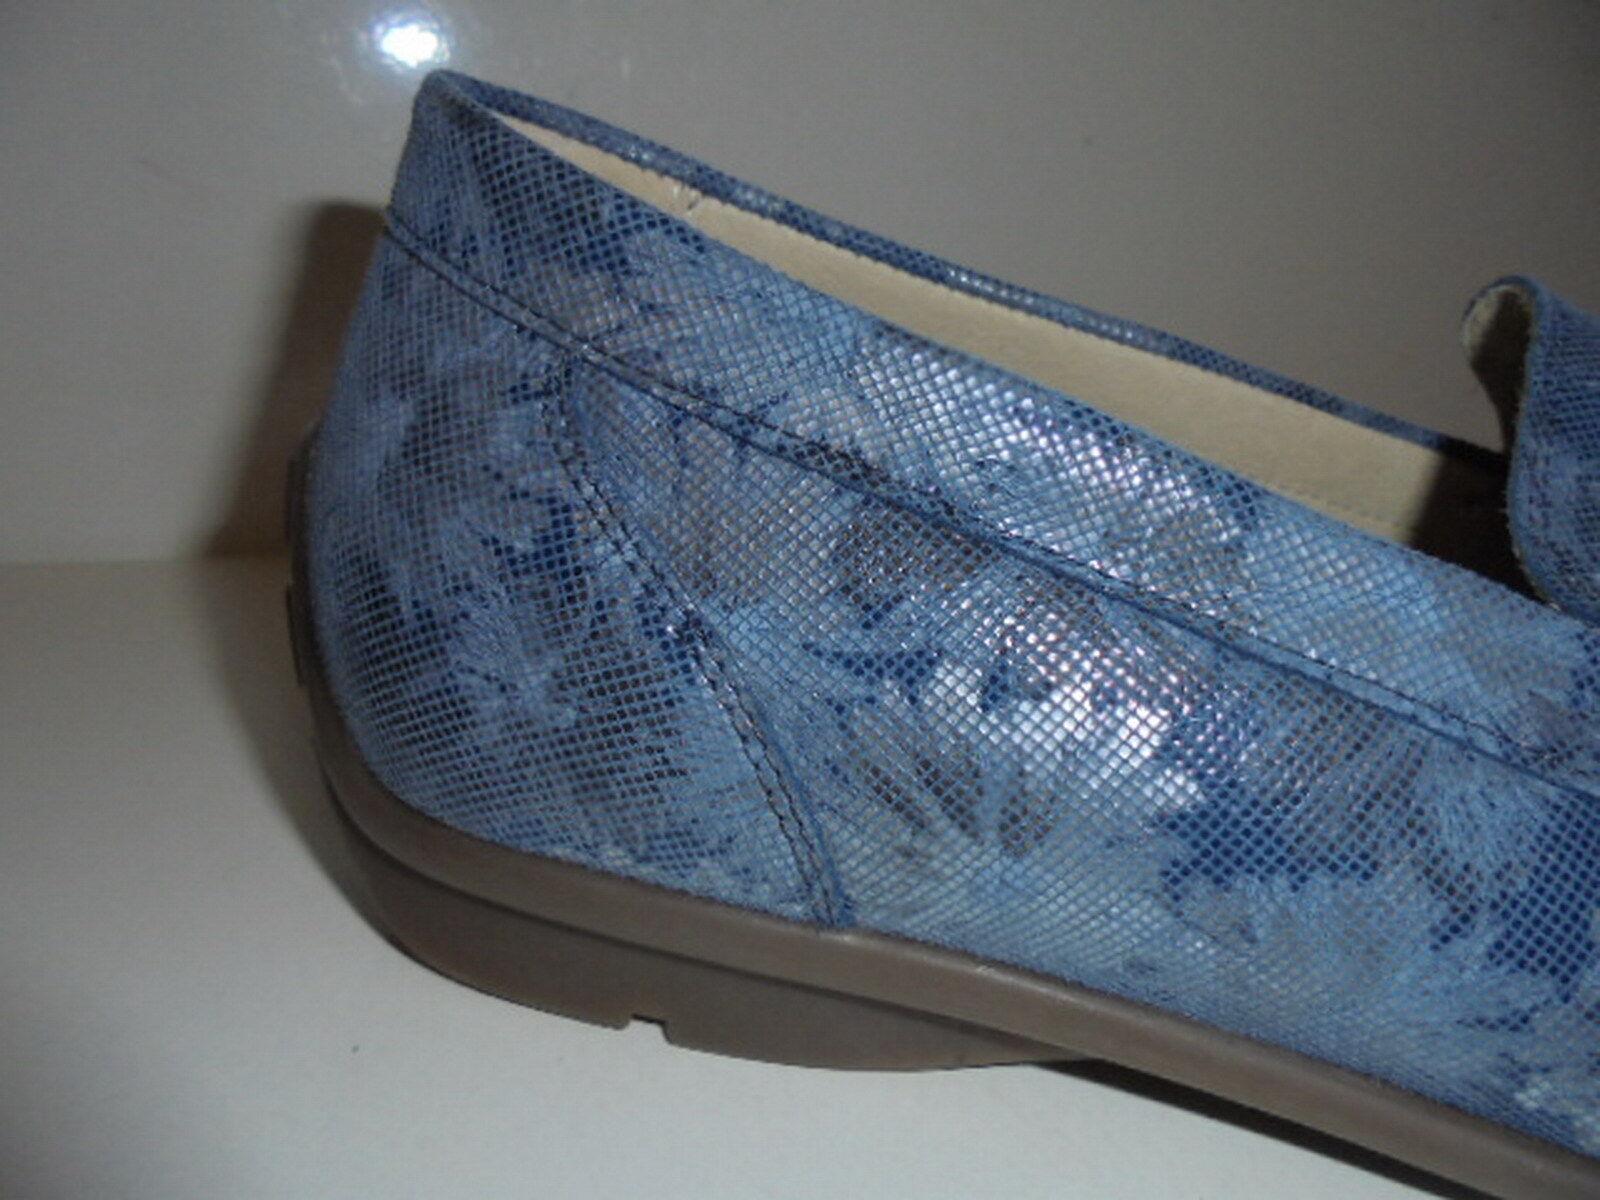 431000 Waldläufer Damenschuhe Mokassin Echtleder blau UK 8½ Gr. 42,5